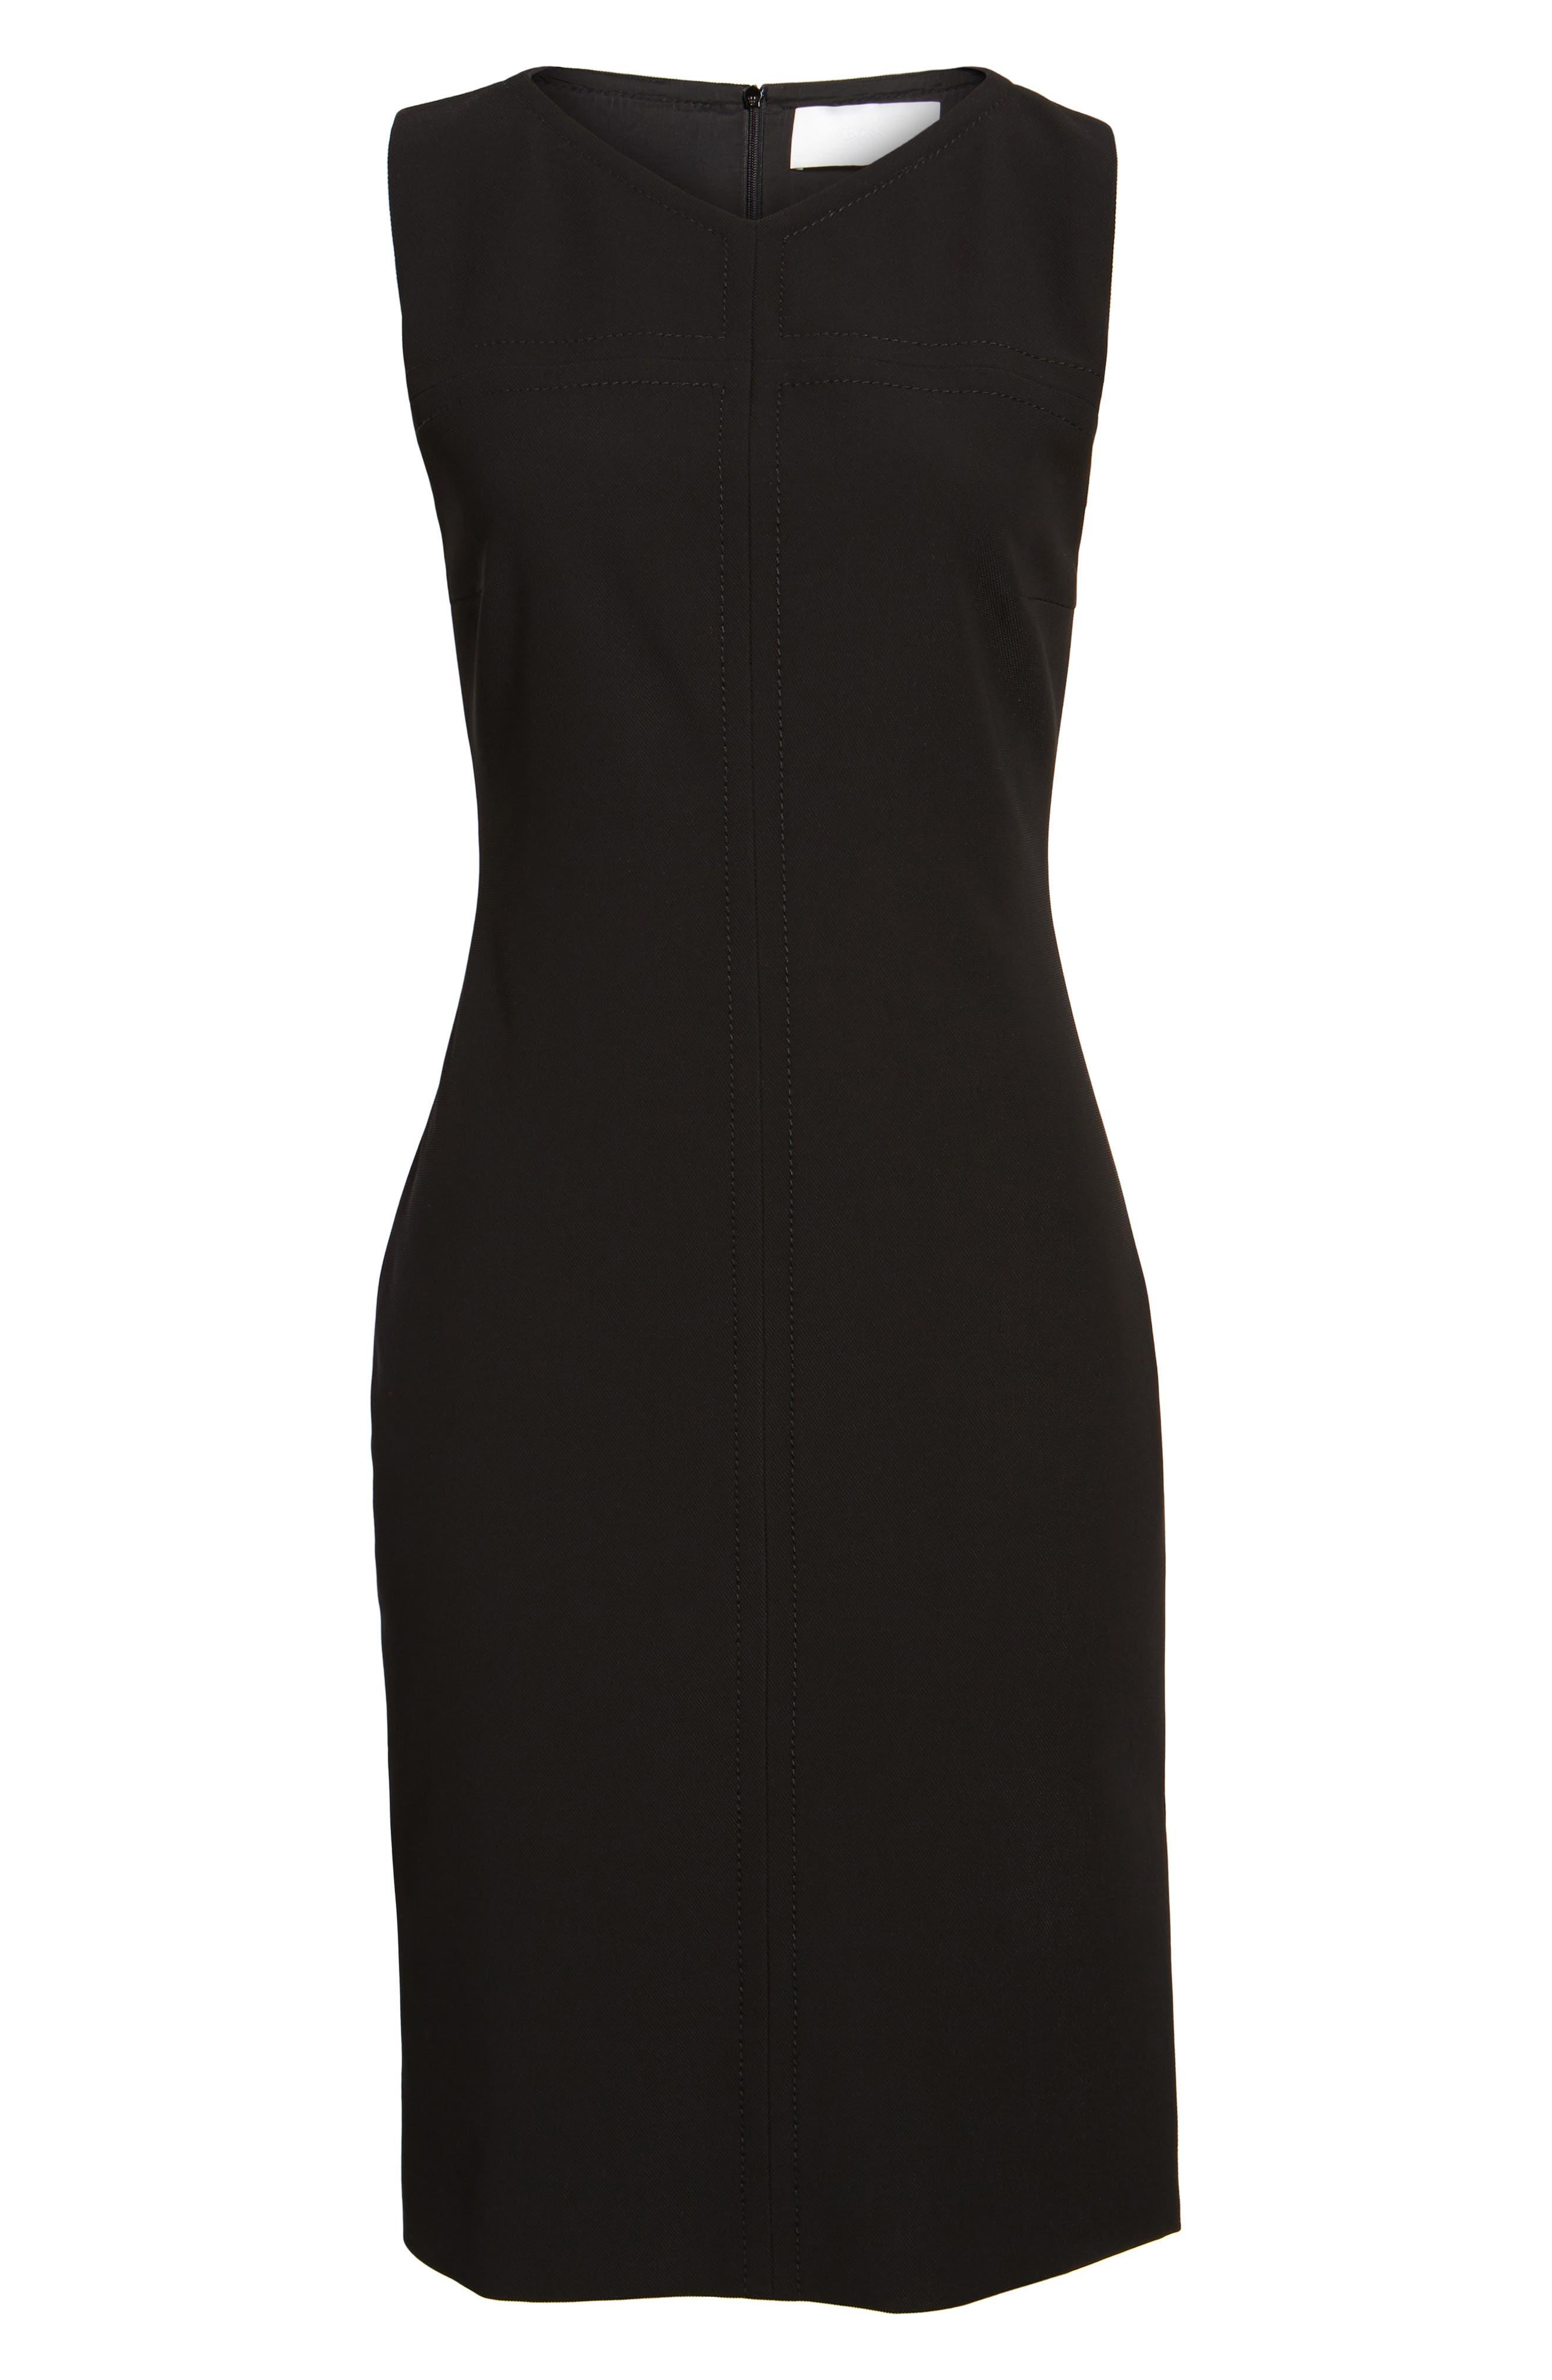 Dilamena Crepe Sheath Dress,                             Alternate thumbnail 6, color,                             001